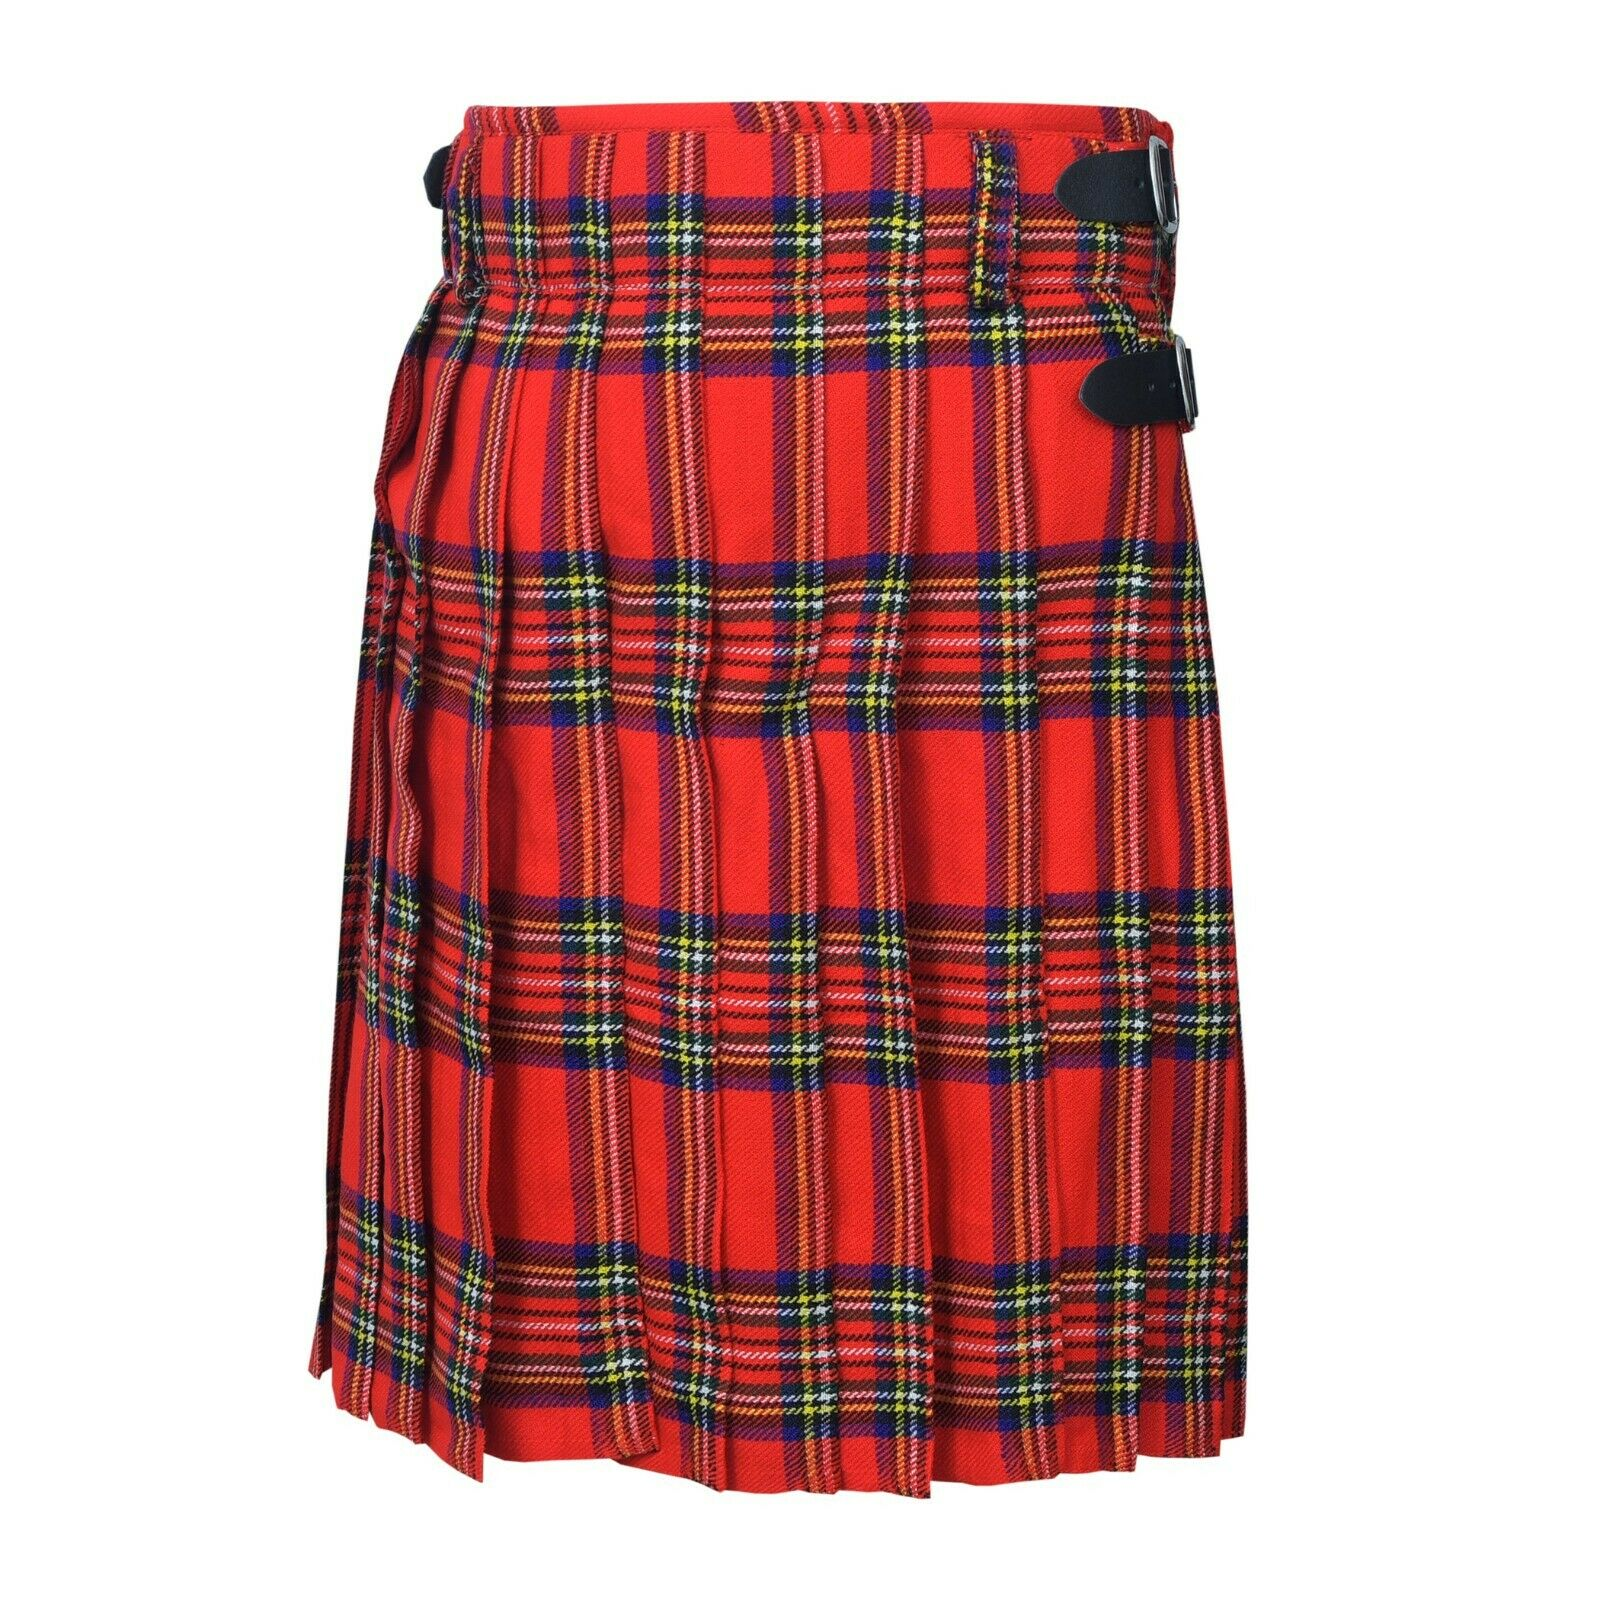 5 Yard Men's Scottish Kilts Royal Stewart Scottish Kilt 13oz Casual Tartan UK